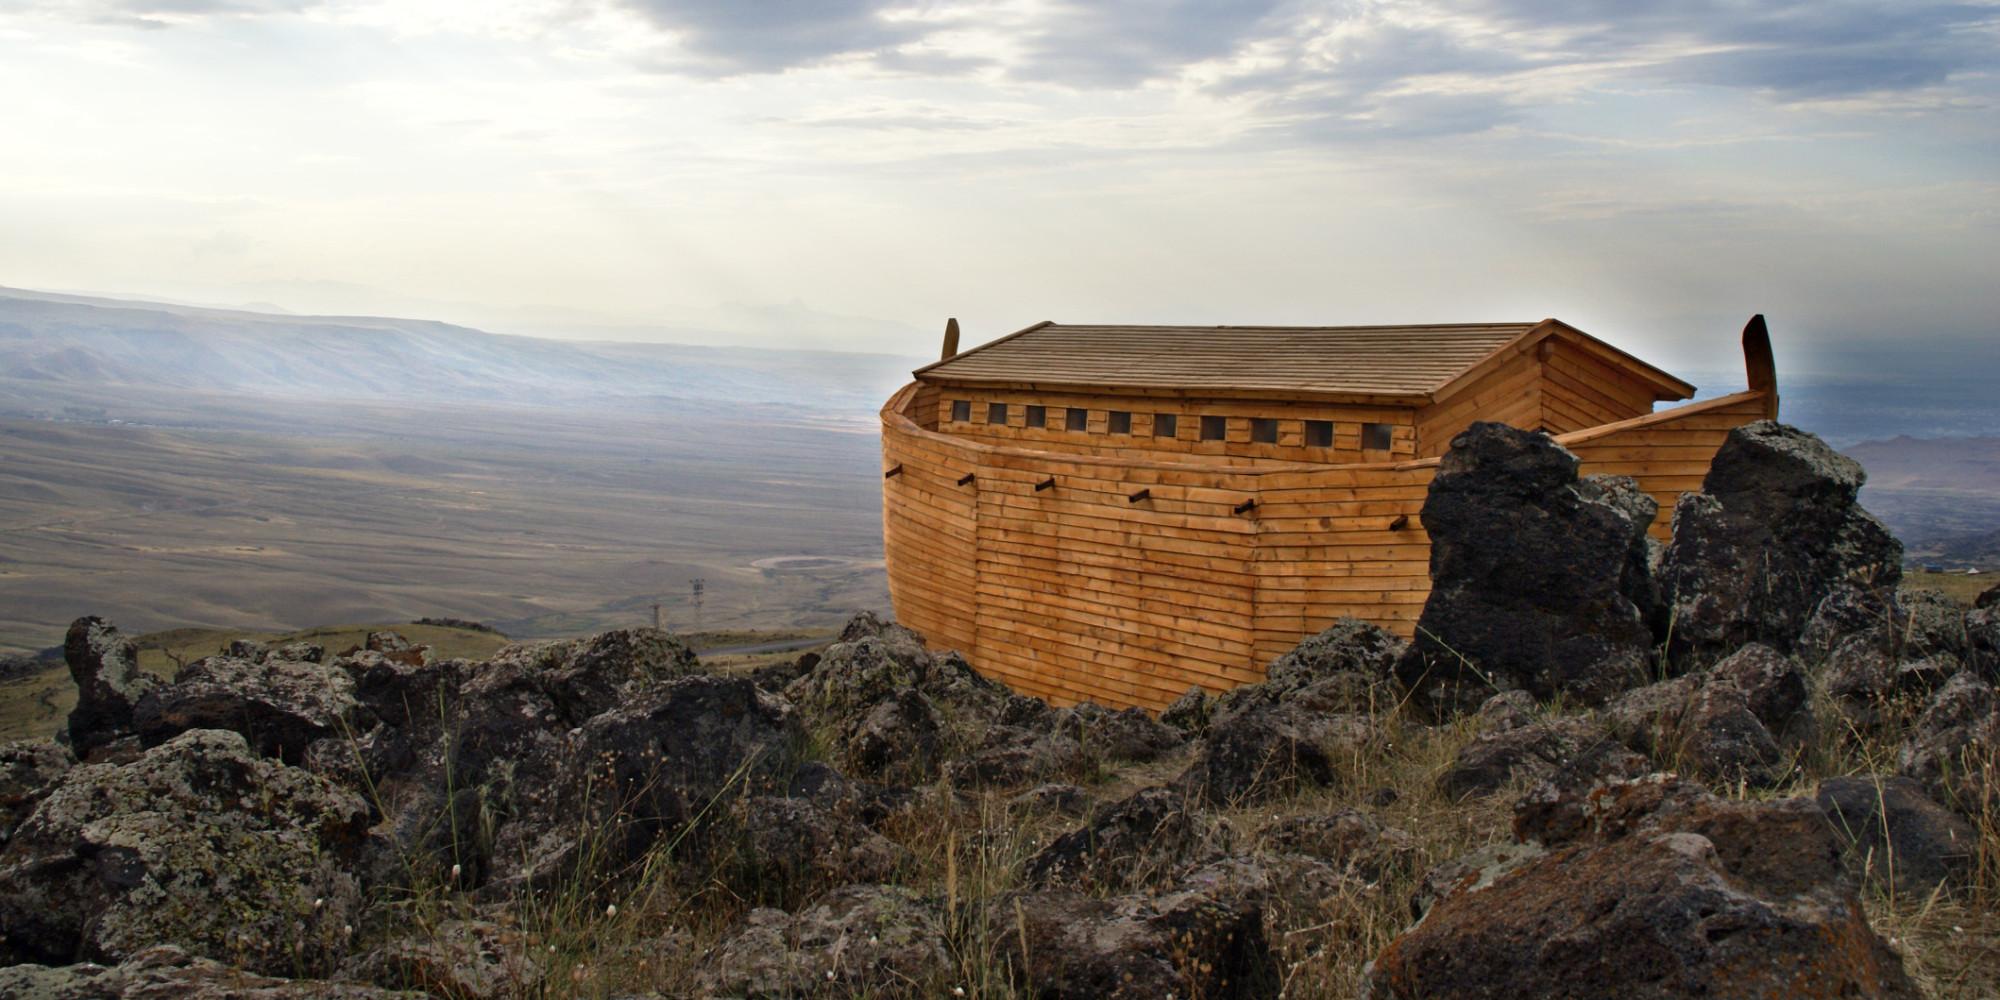 Noah S Ark To Be Built As Part Of Biblical Theme Park Near